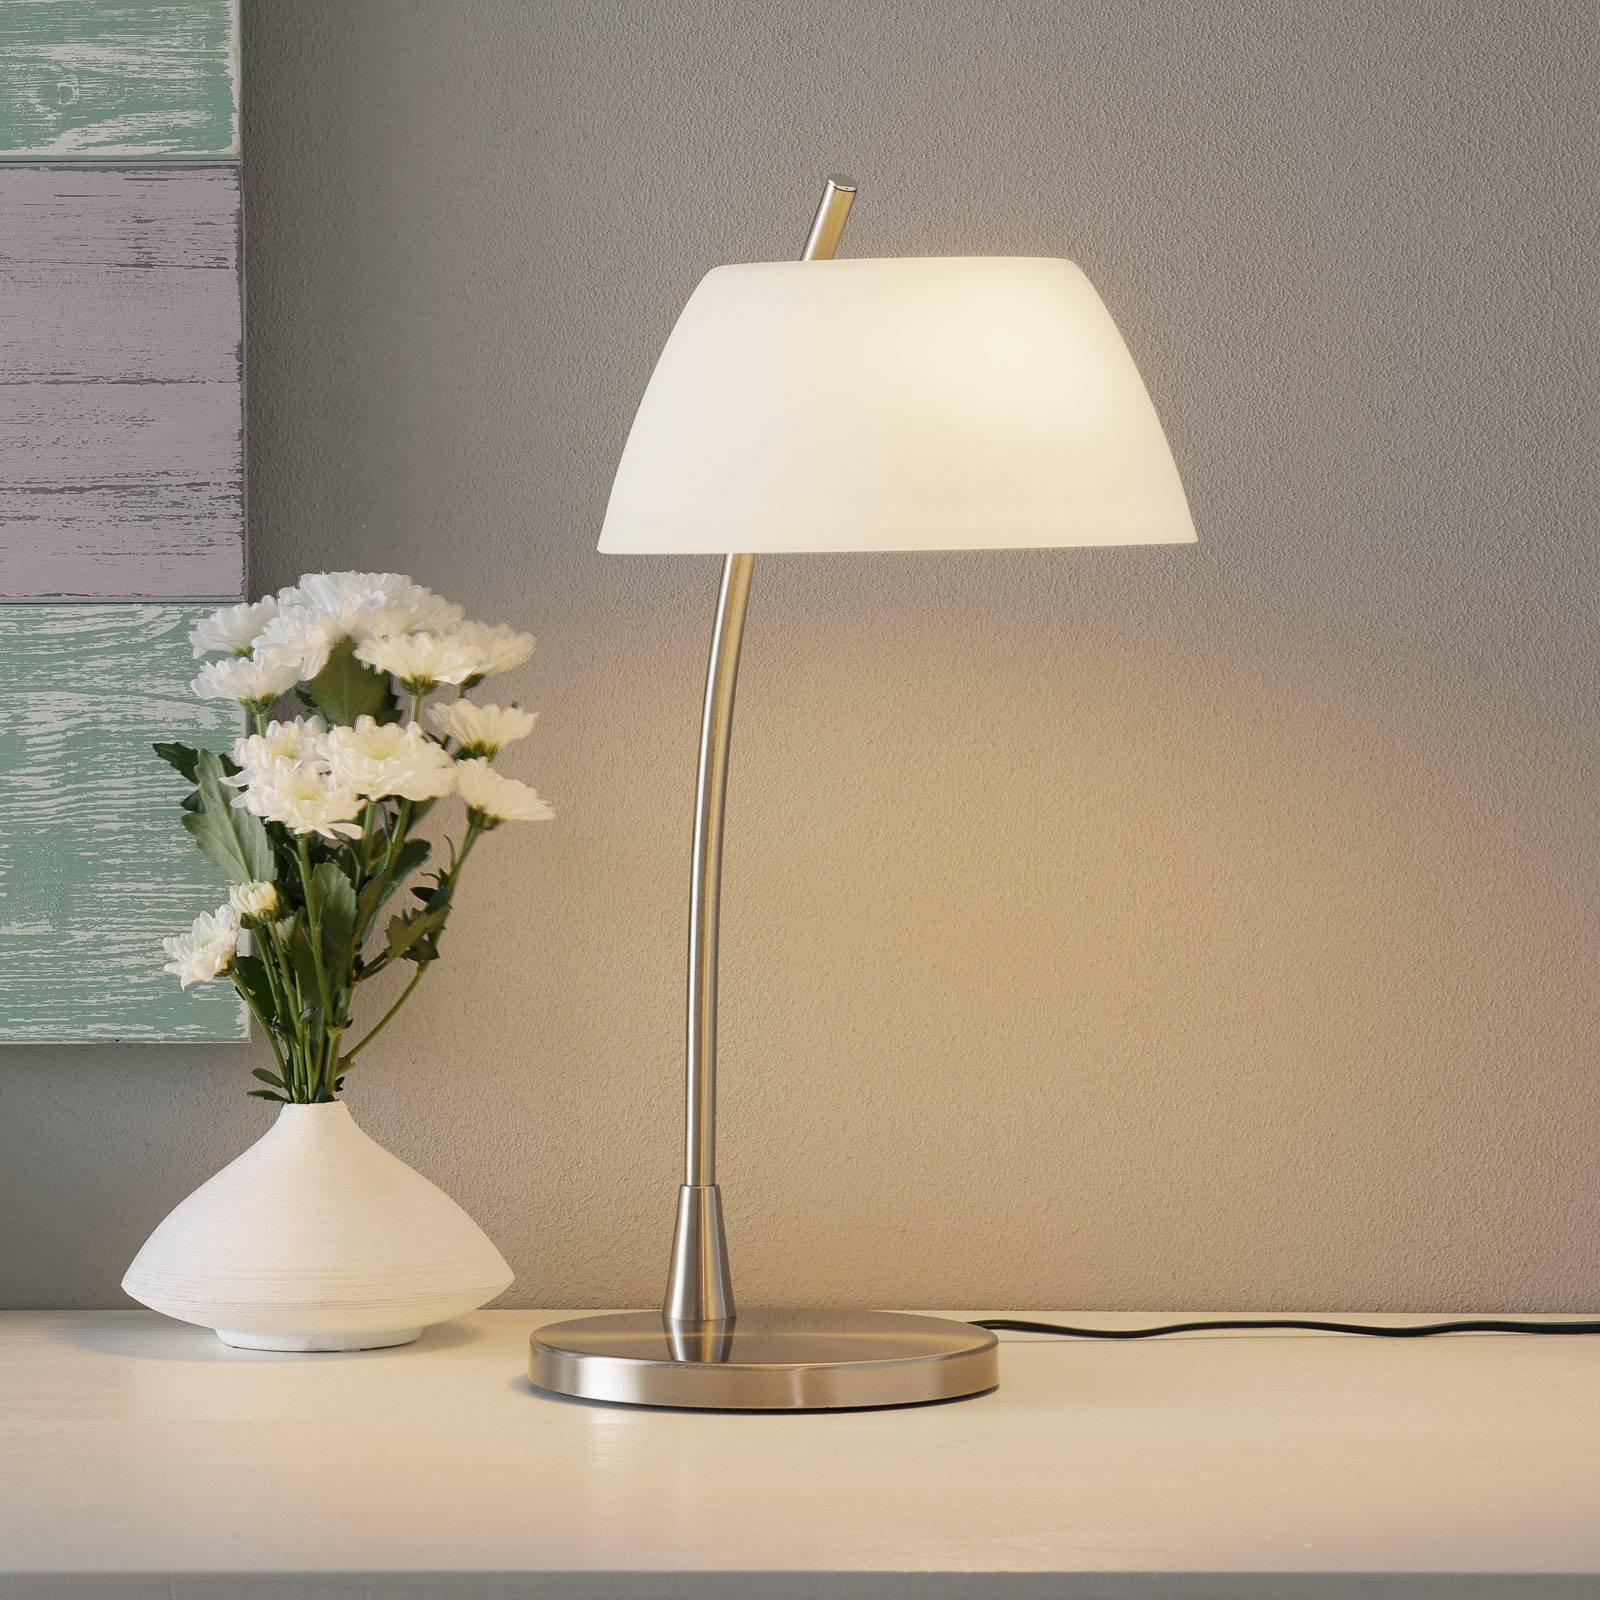 Forniklet bordlampe Malmø, nikkel